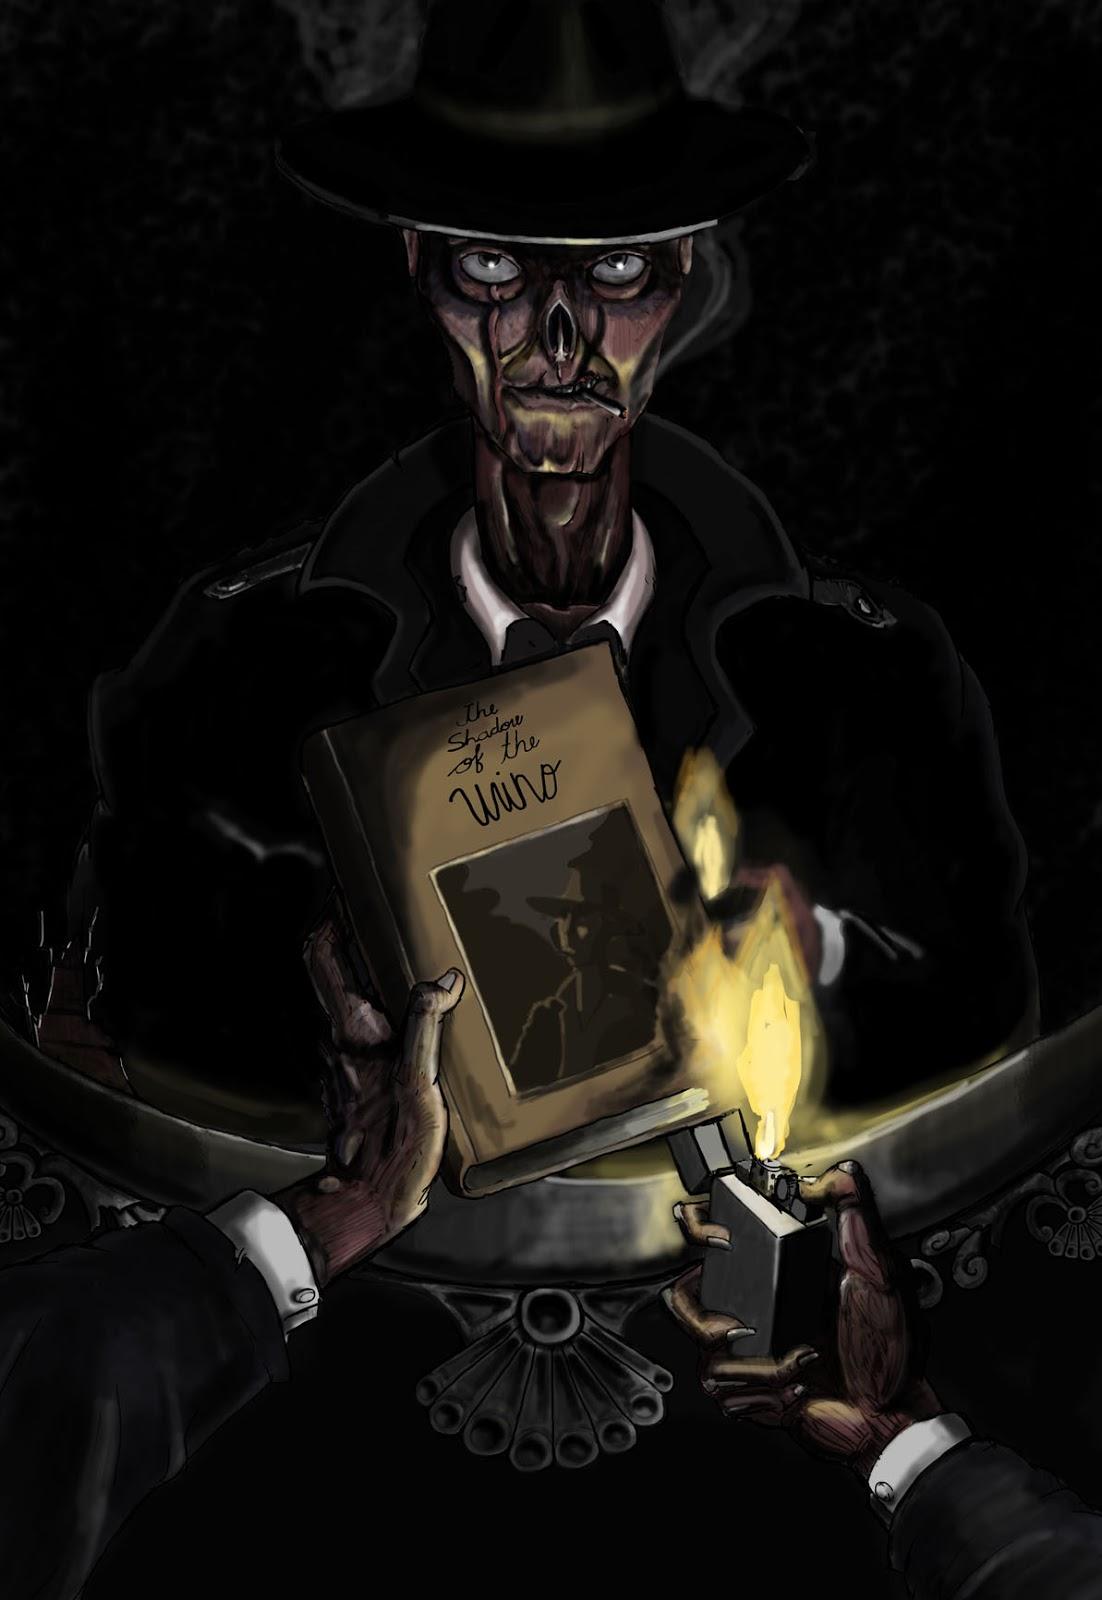 shadow of the wind by carlos ruiz zafon book review